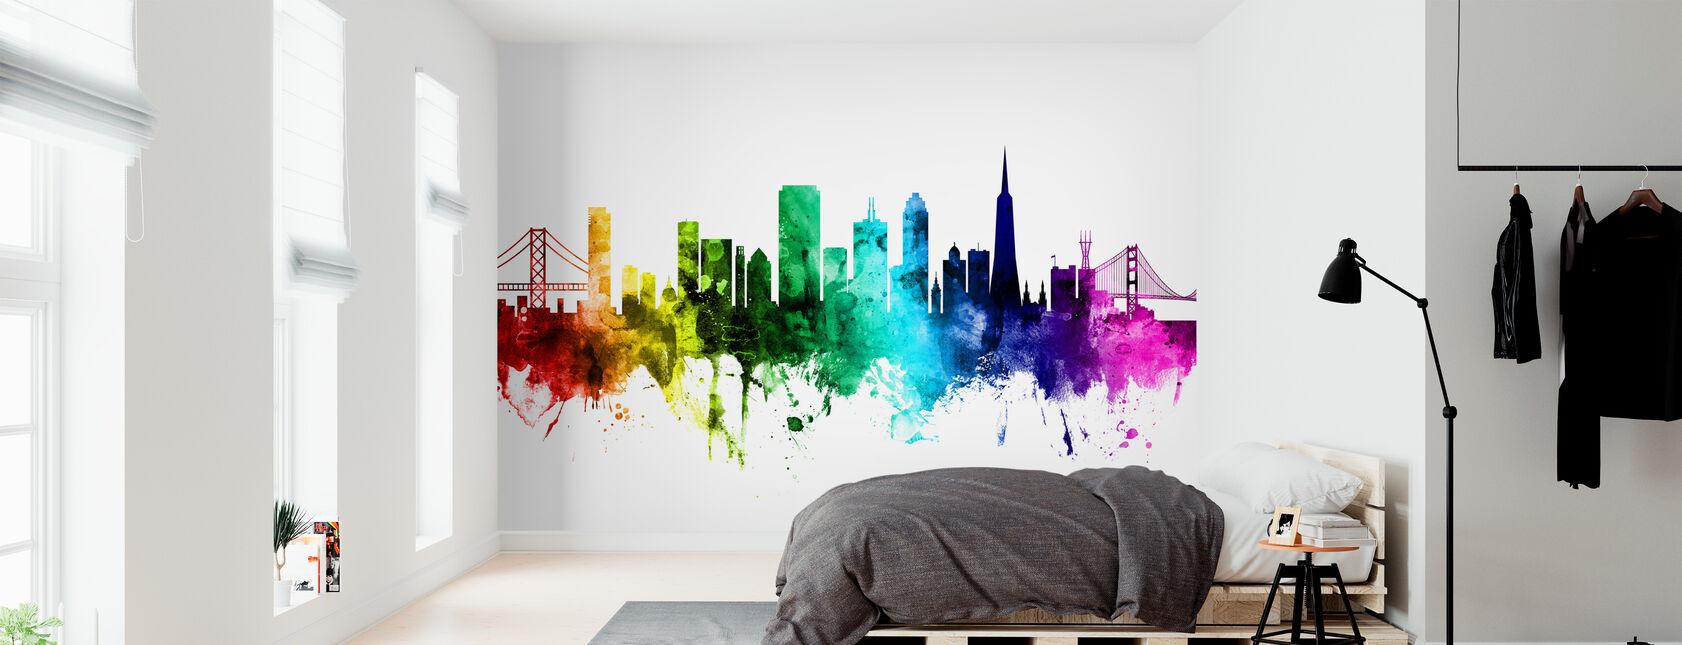 San Francisco City Skyline Rainbow - Wallpaper - Bedroom